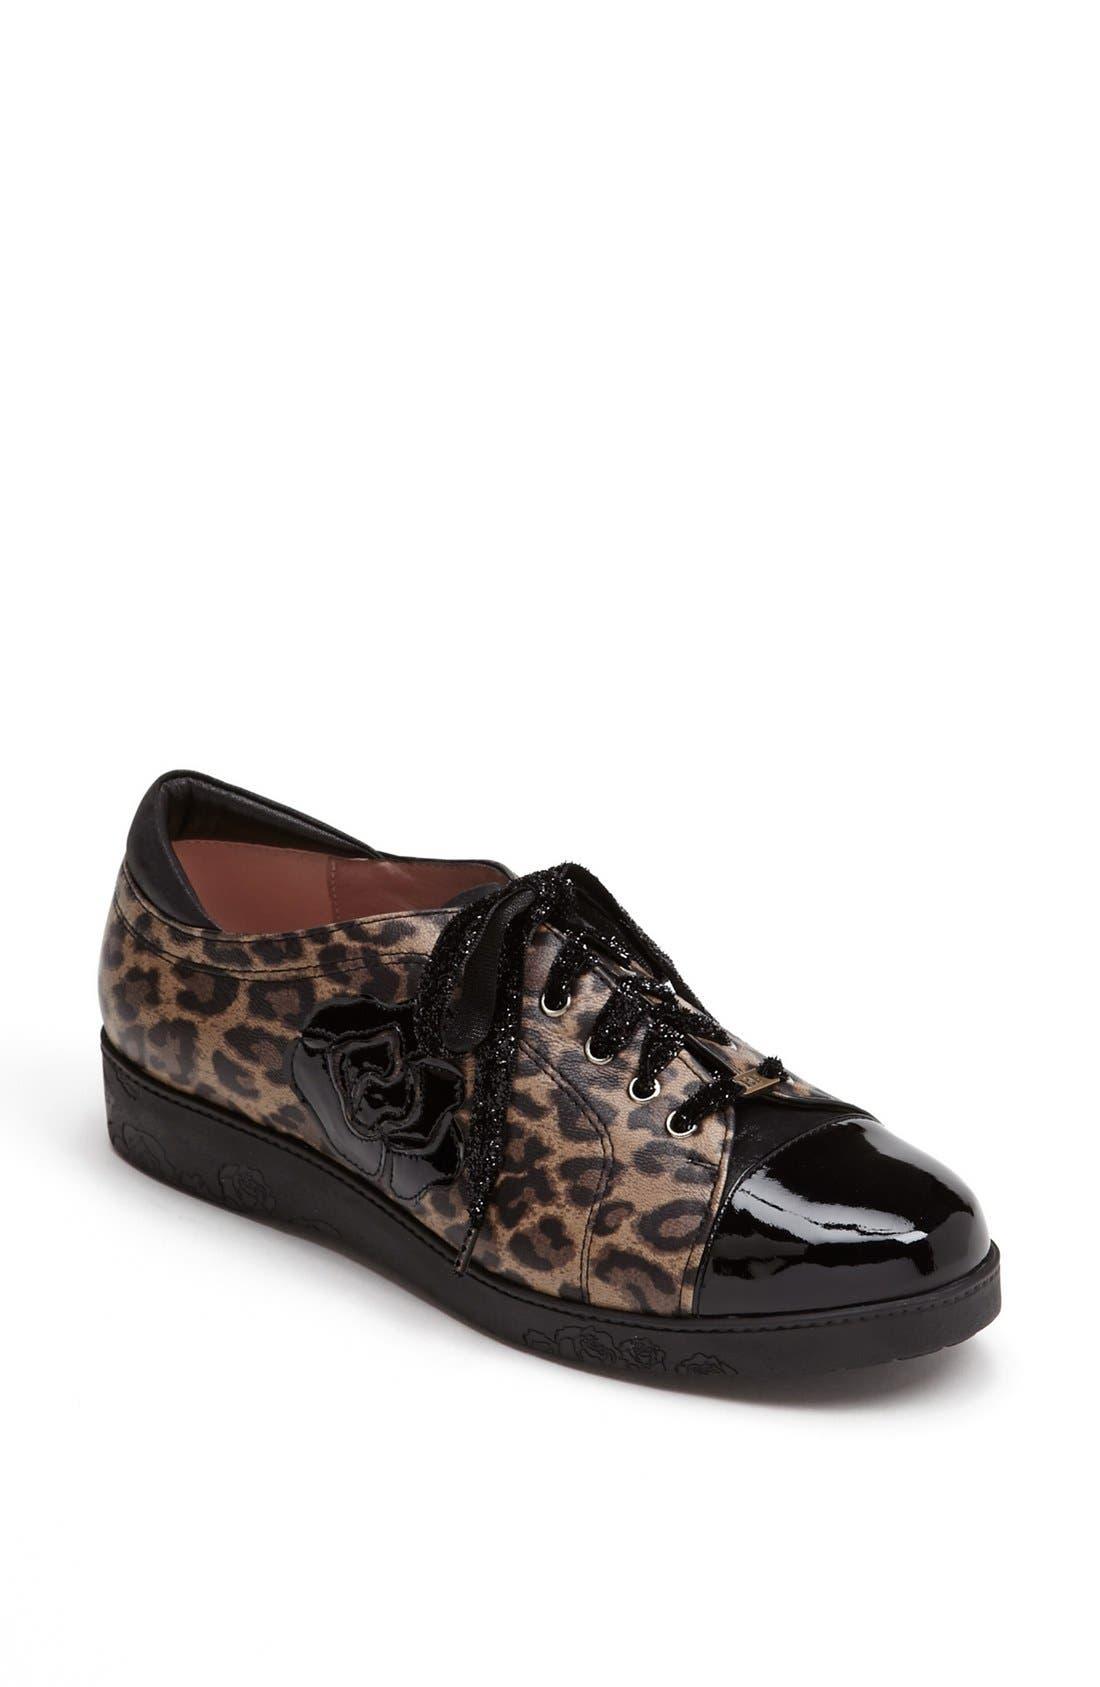 'Aria' Sneaker,                             Main thumbnail 1, color,                             Leopard Print Leather